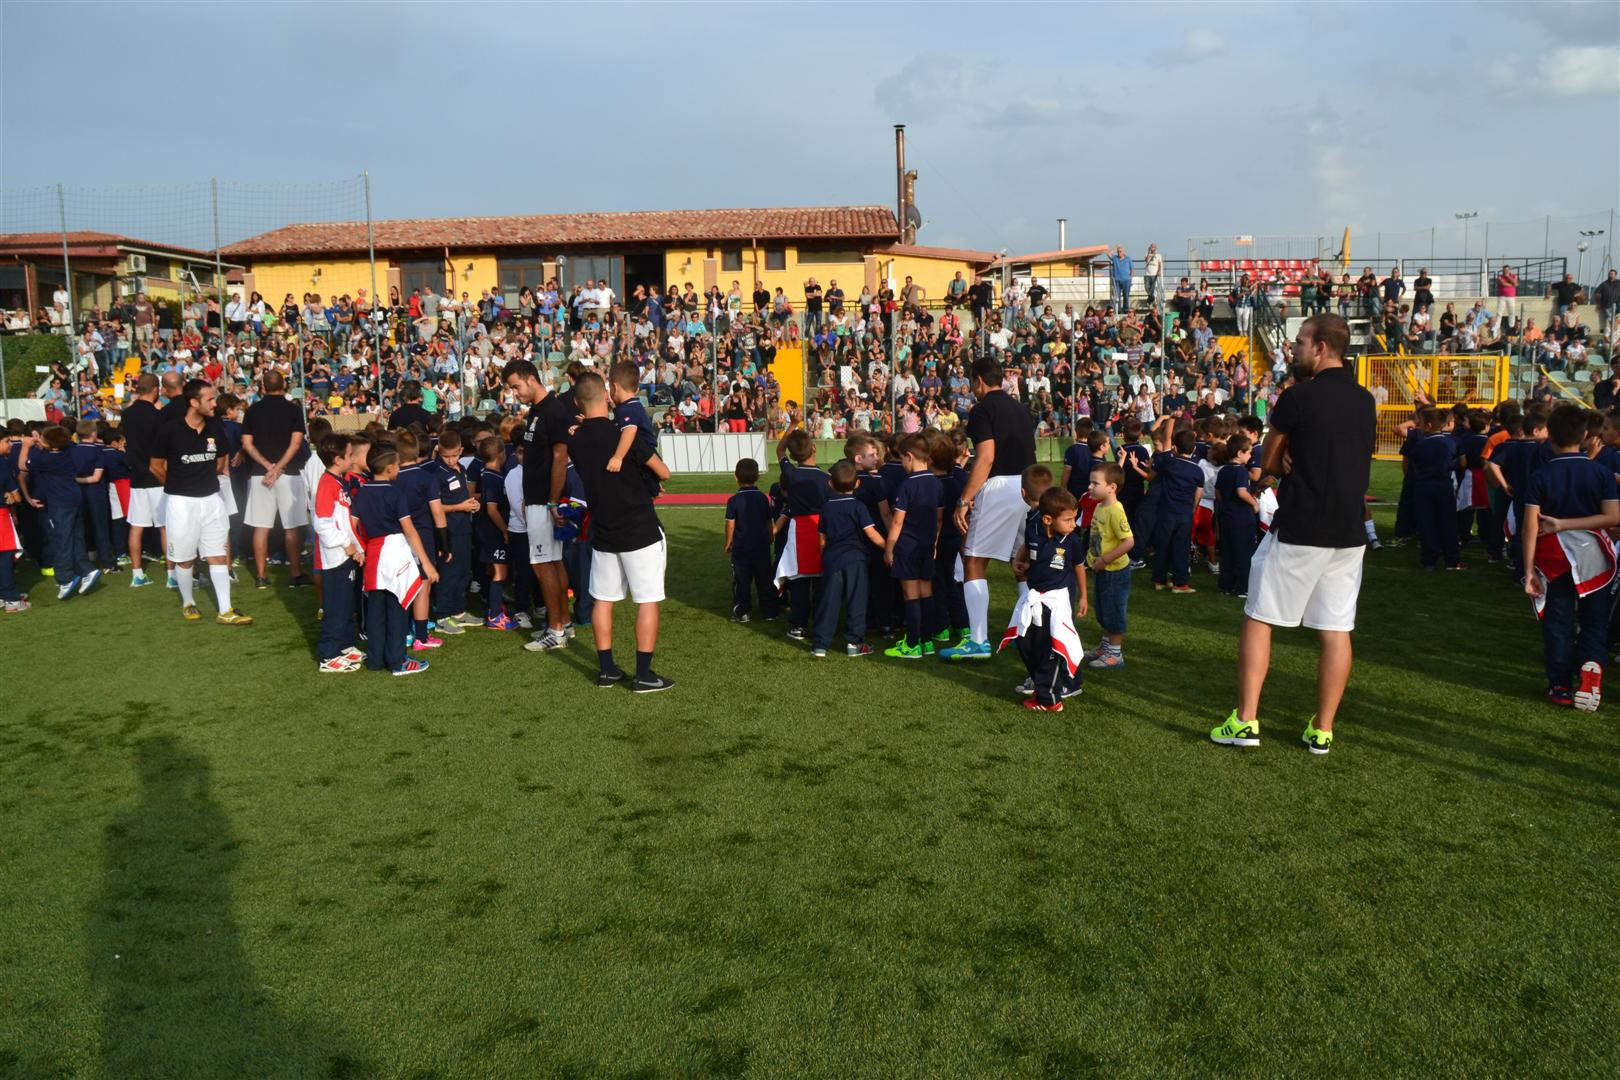 generica festa apertura scuola calcio (16)